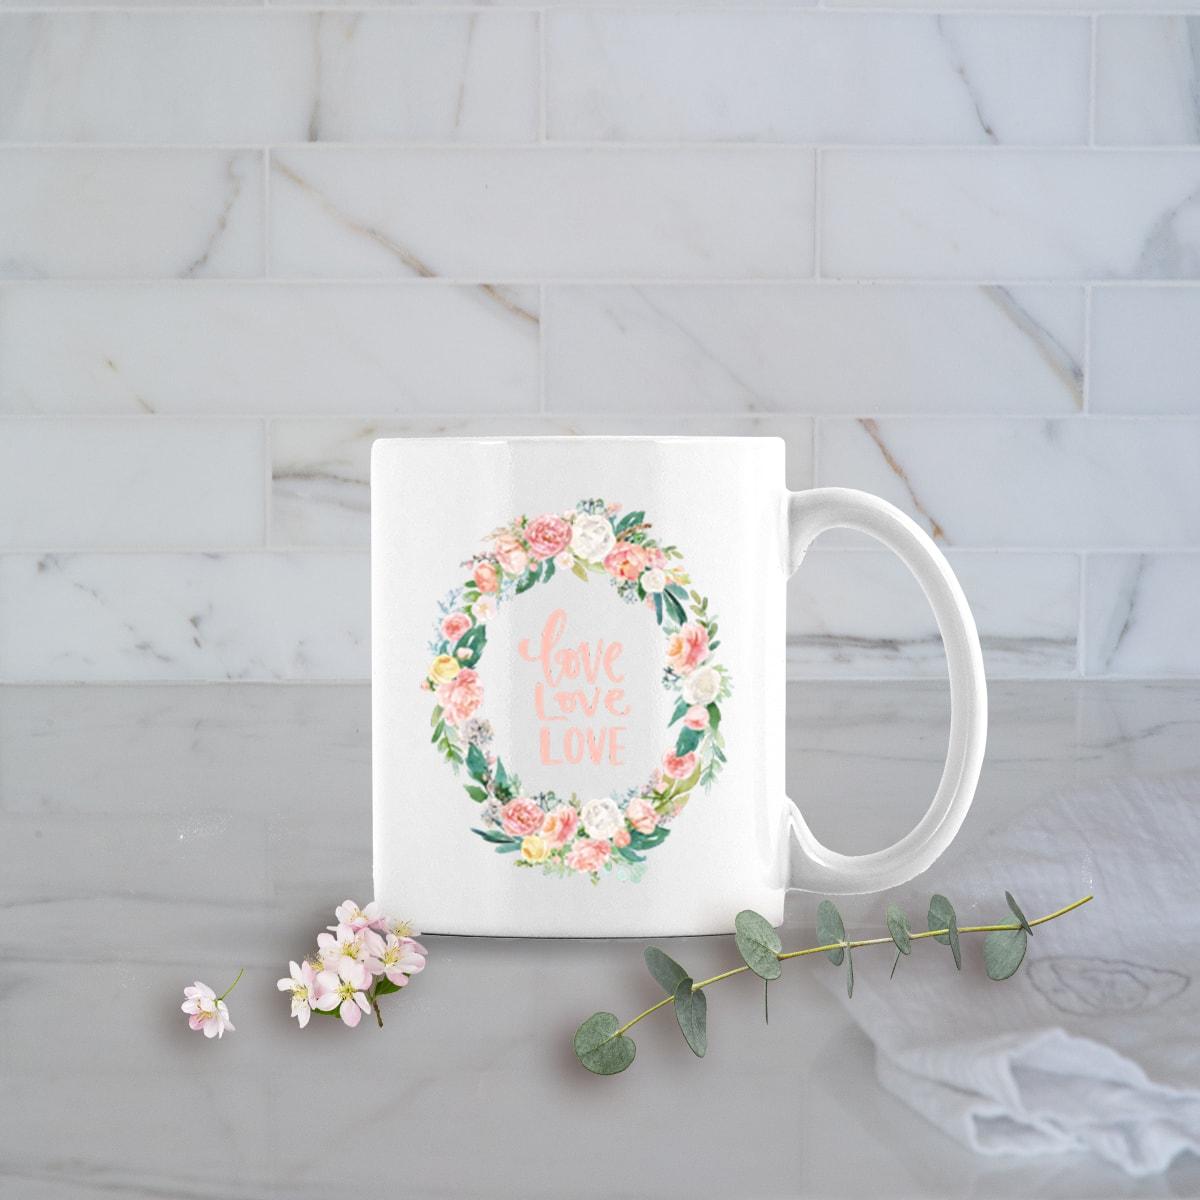 Valentines Day Gifts 11oz Love Love Love mug